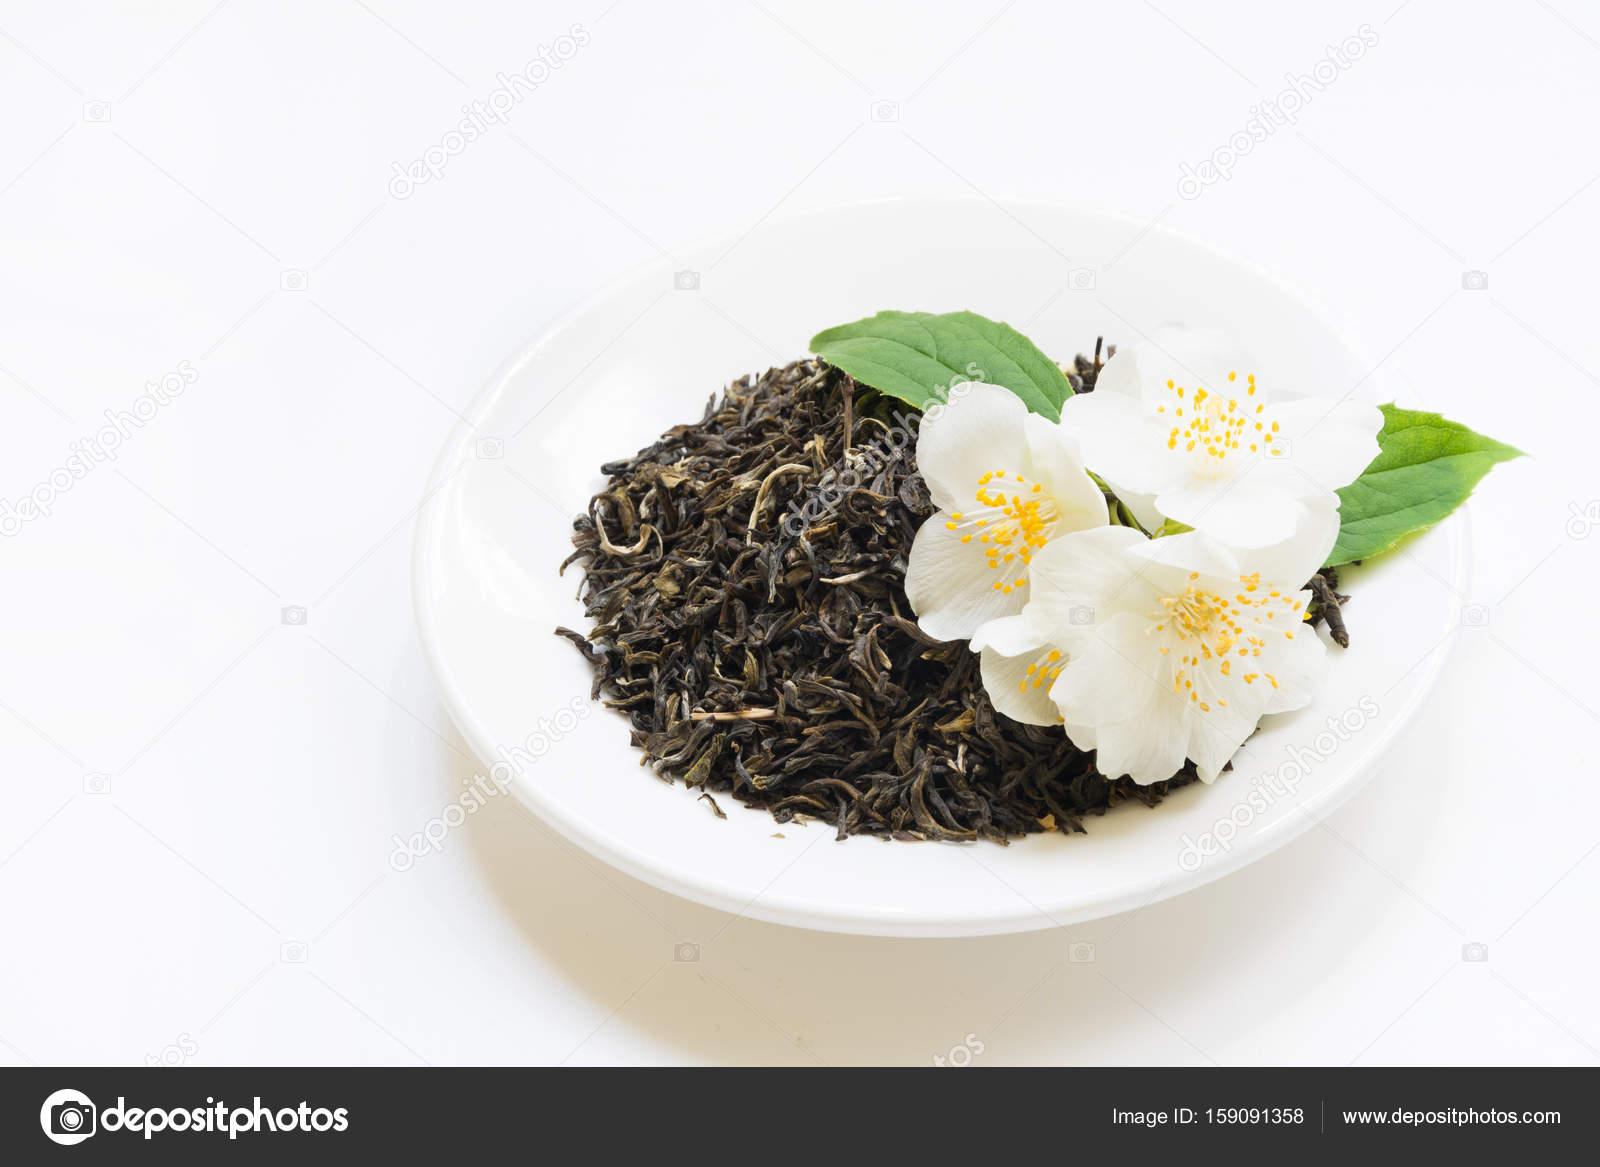 Jasmine Dry Green Tea On White Plate With Decor From Fresh Jasmin